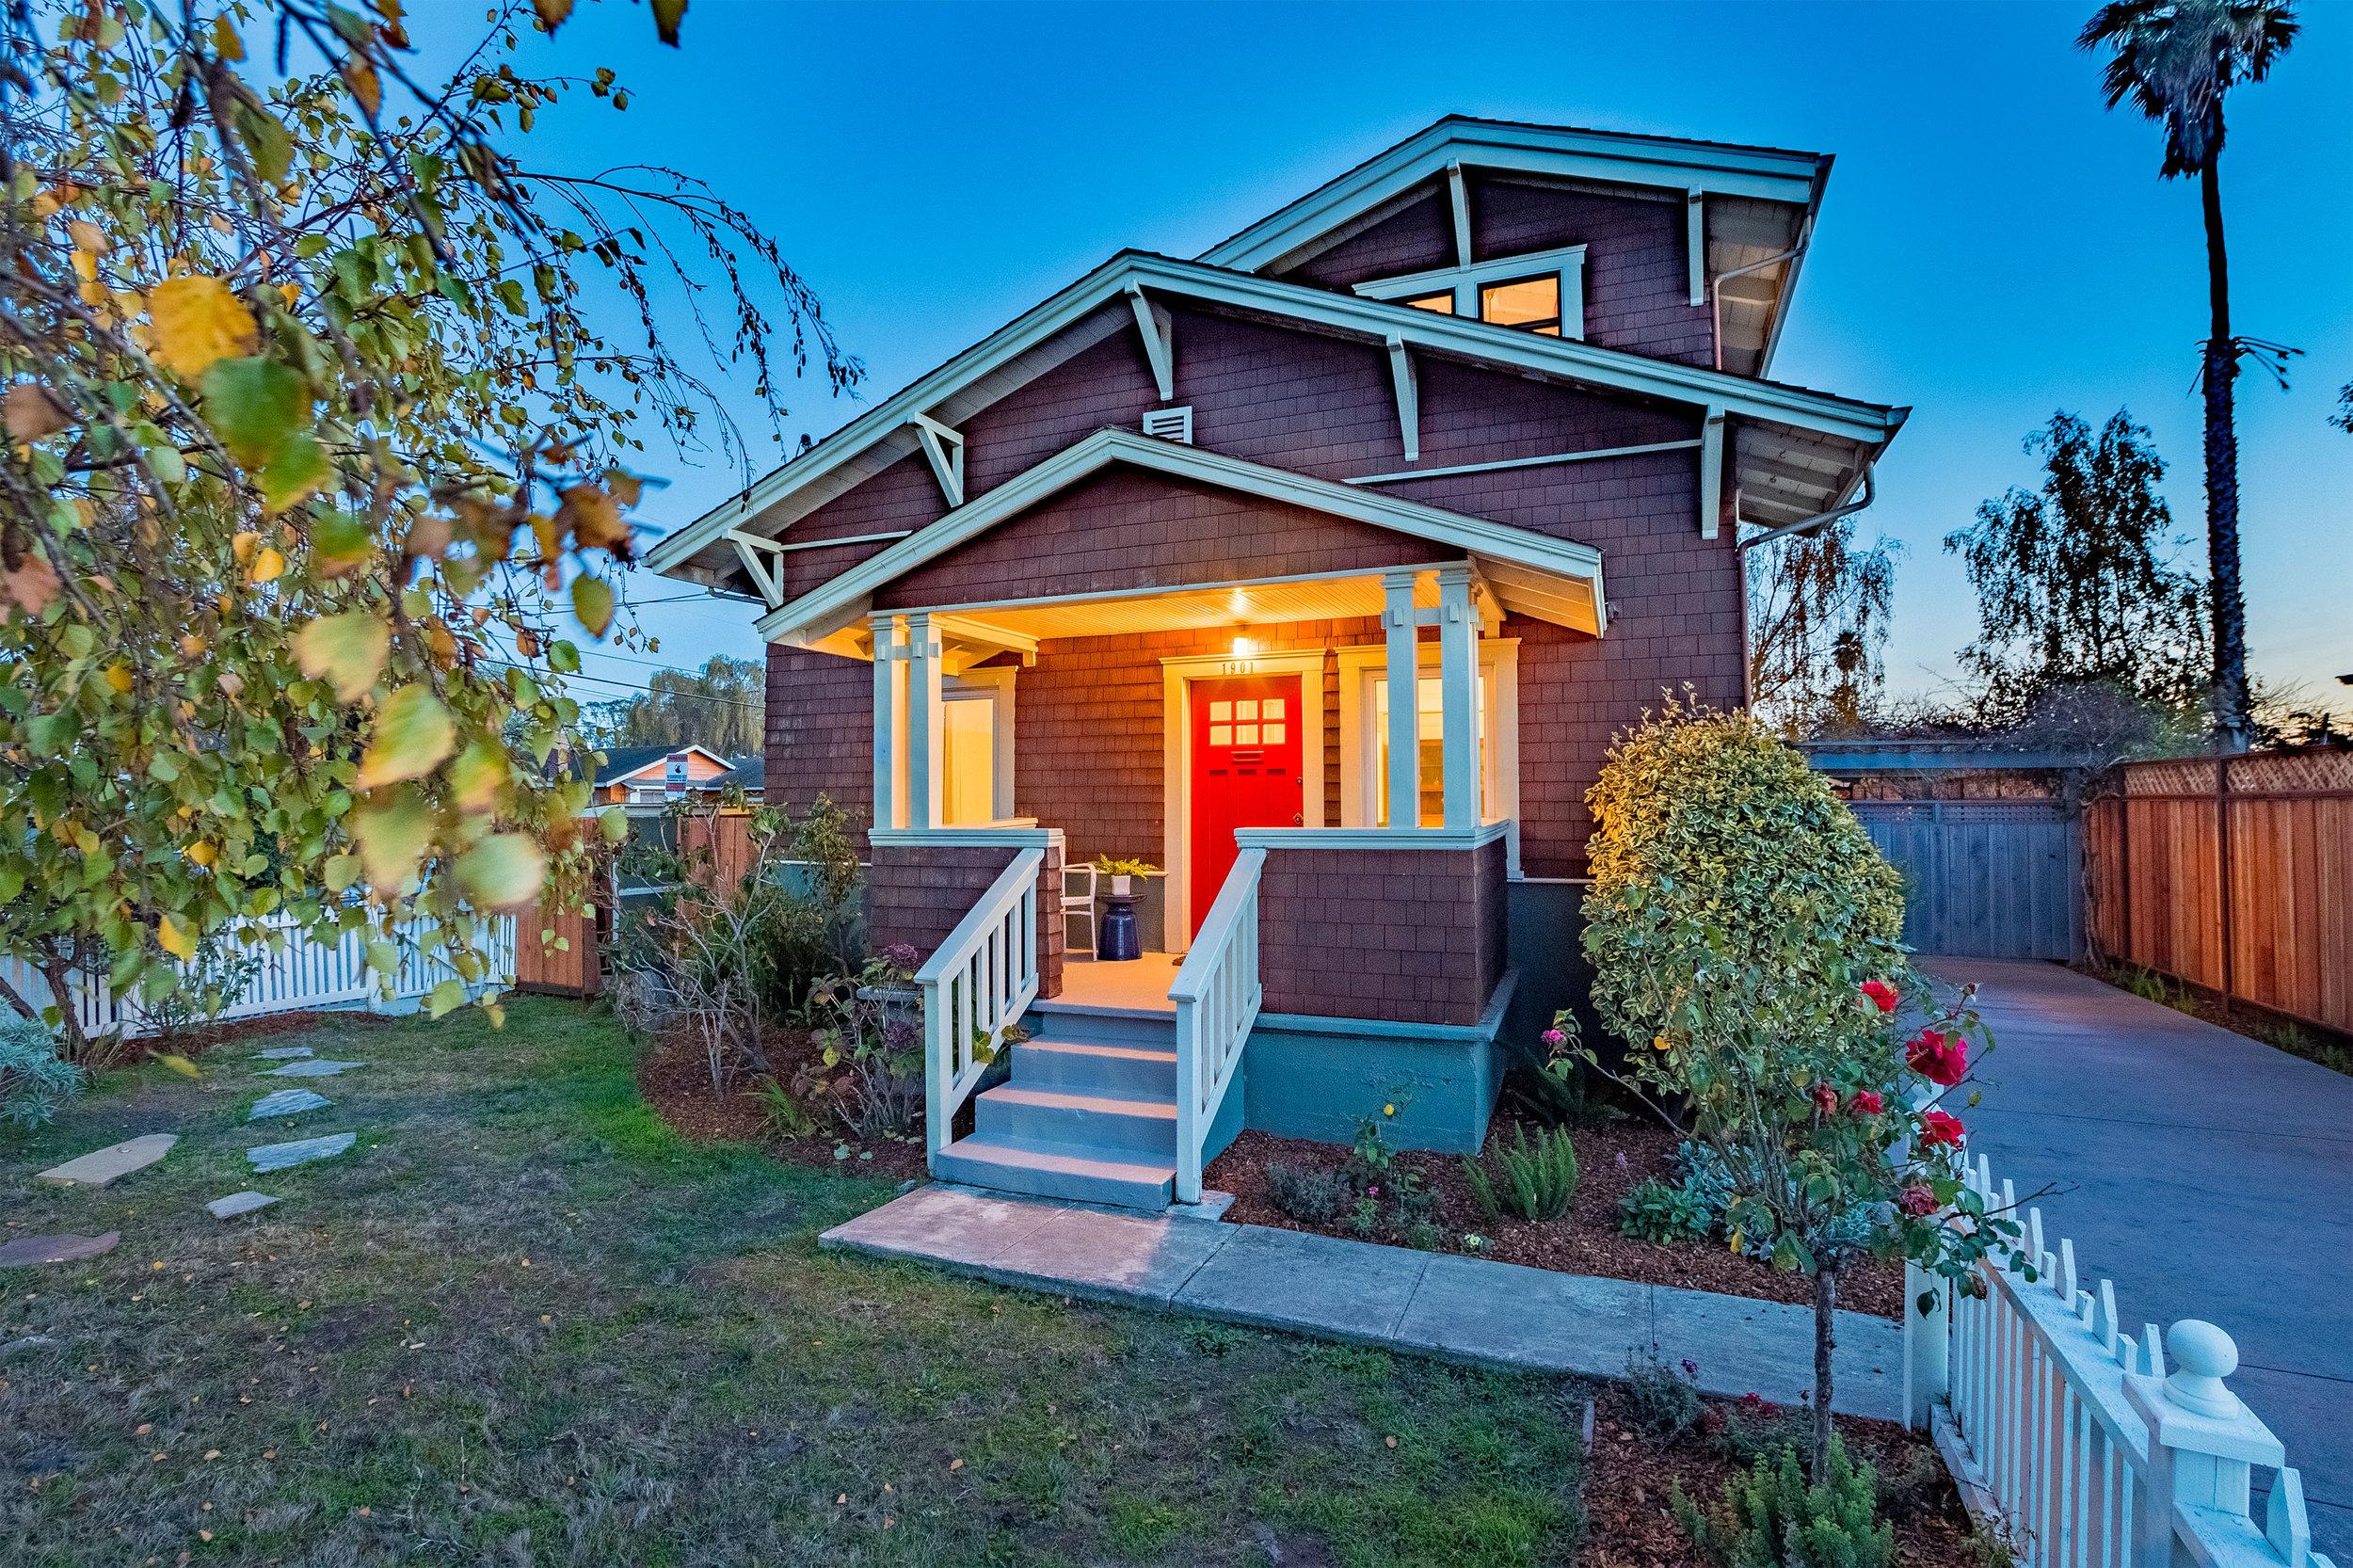 Large Craftsman Style Home in Santa Cruz County